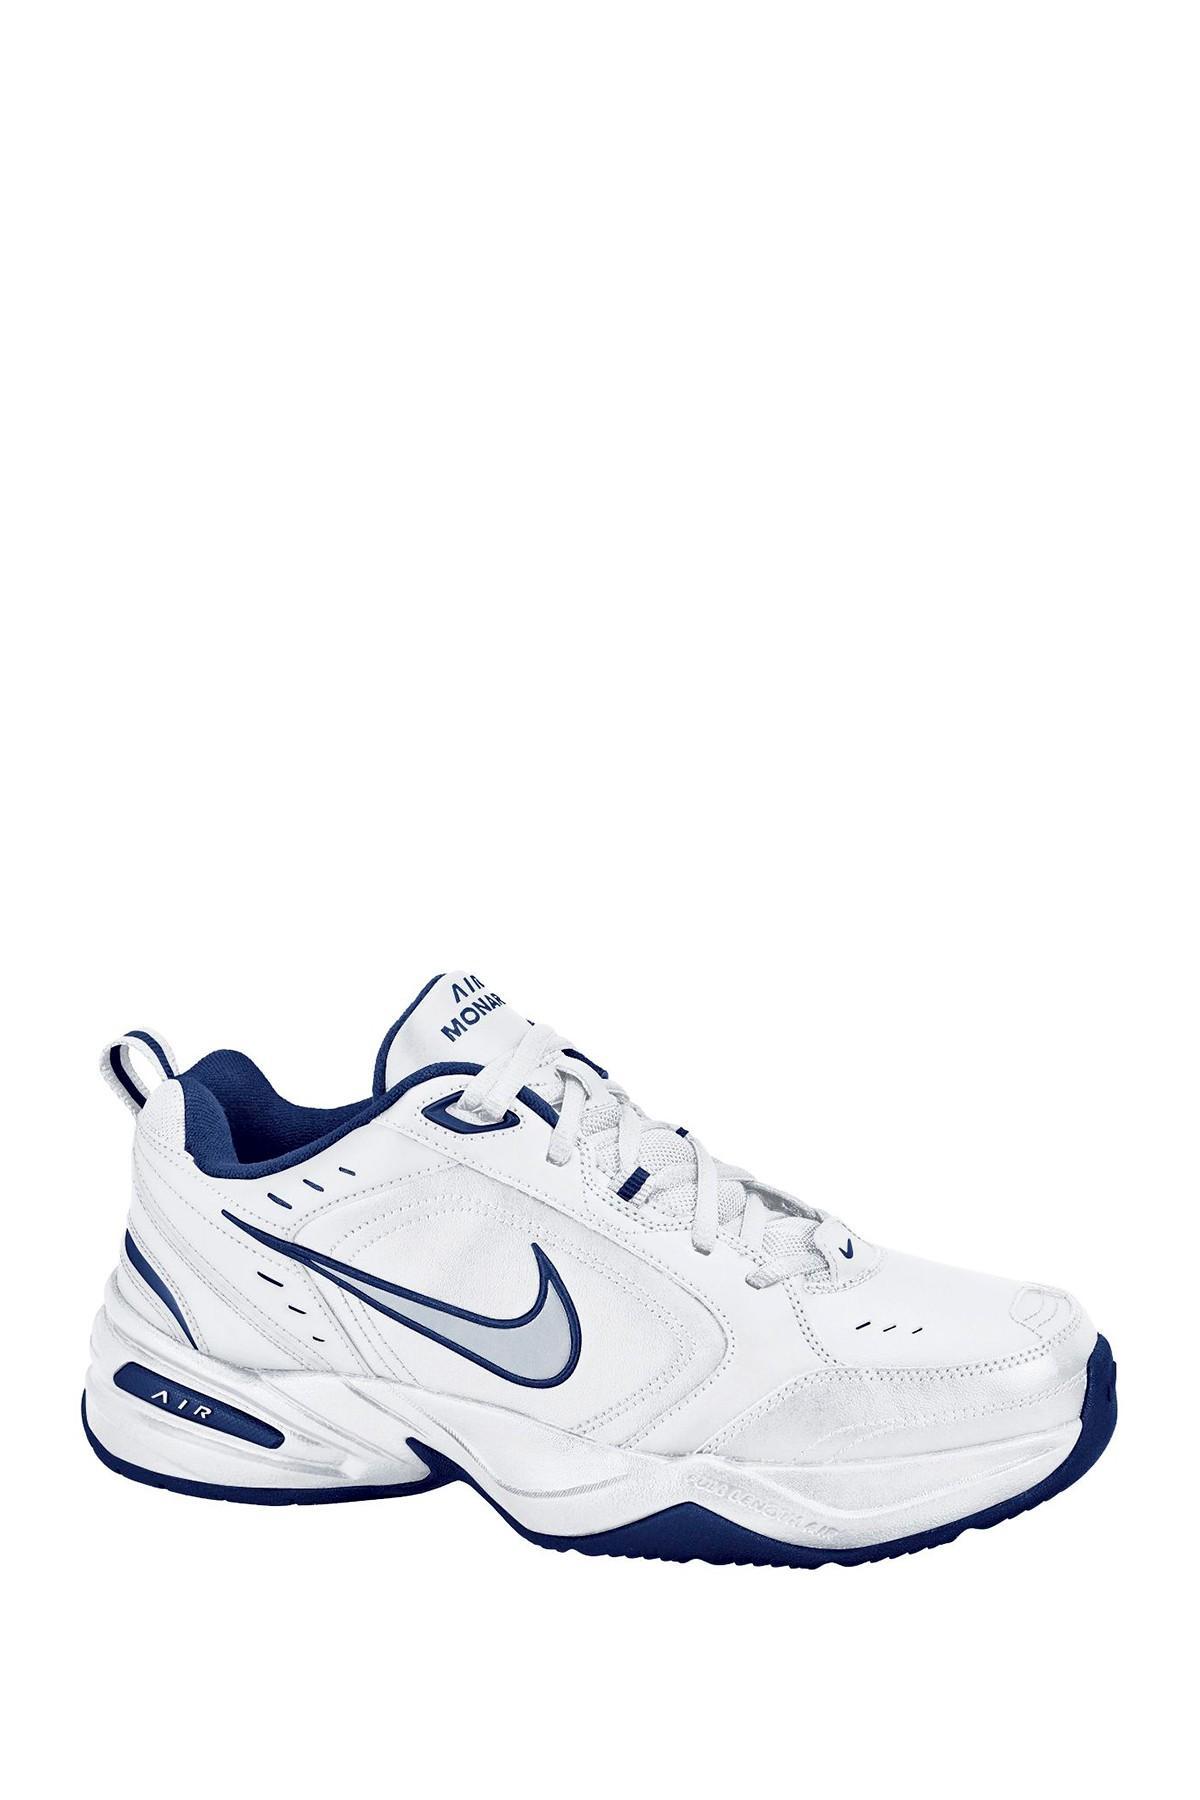 fe601d03062d Lyst - Nike Air Monarch Iv 4e Training Sneaker - Extra Wide Width ...